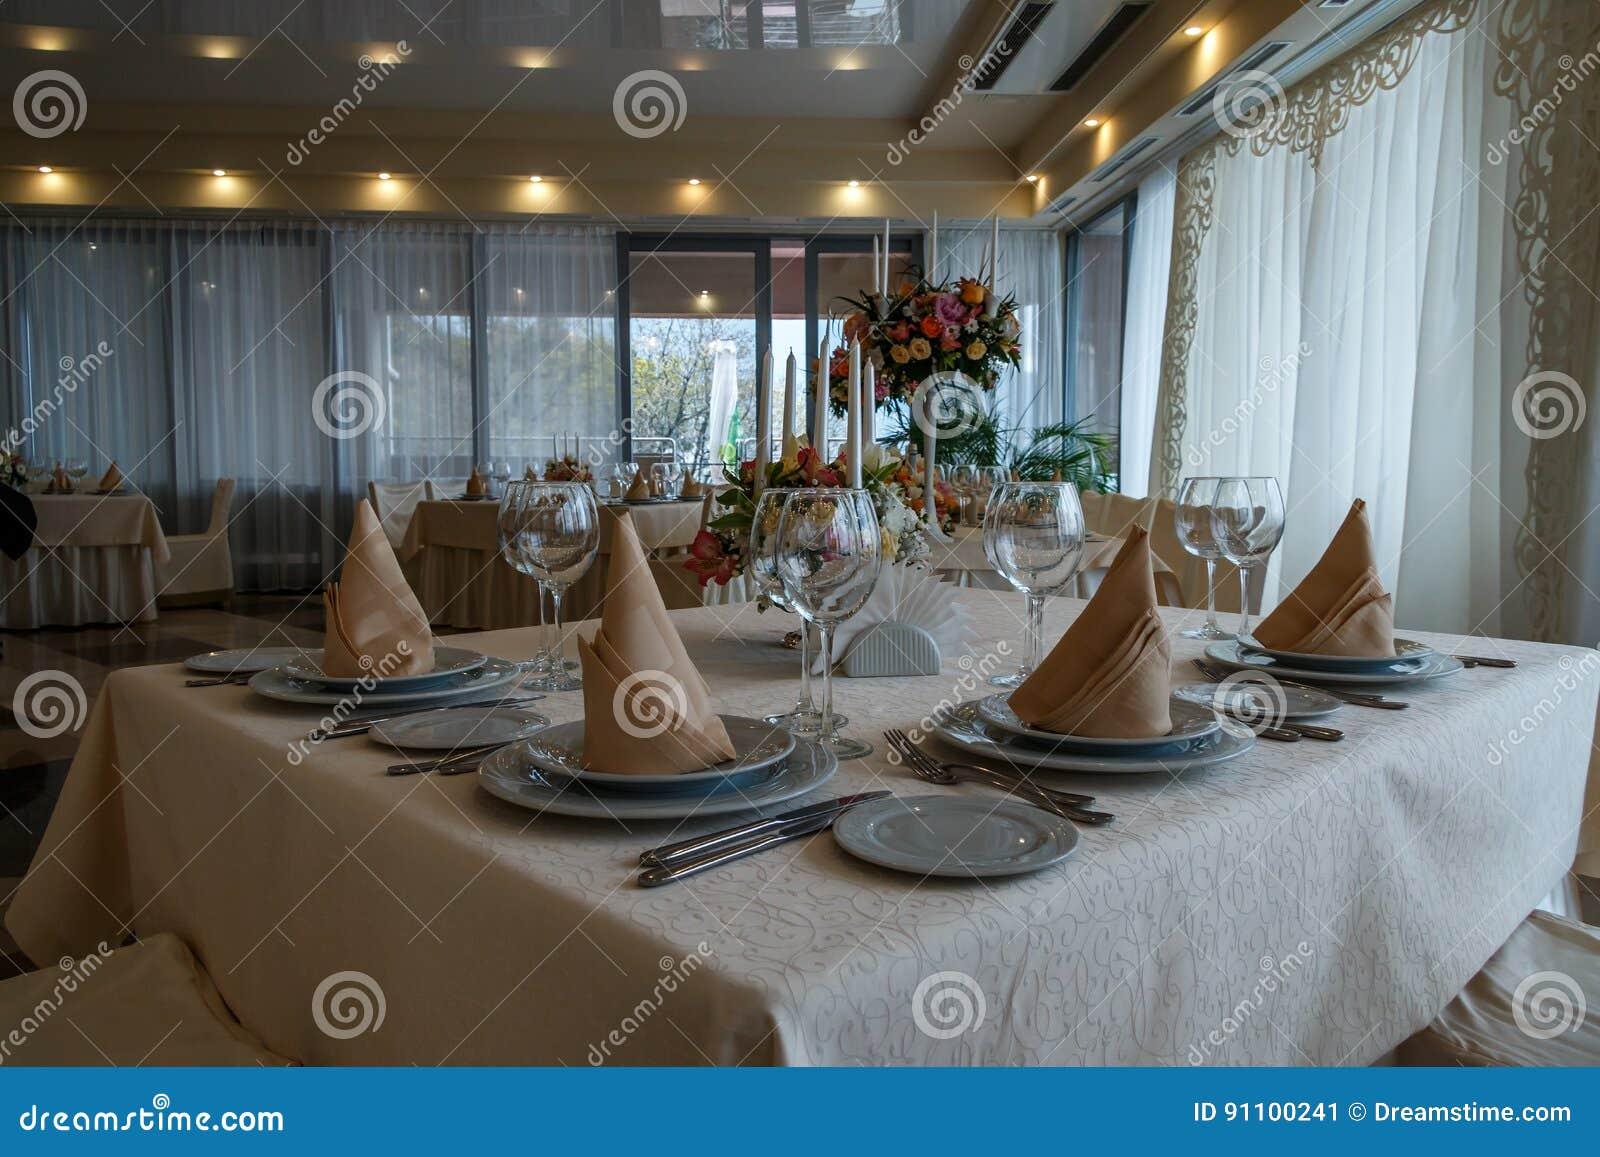 Beautiful Restaurant Interior Table Decoration For Wedding Stock